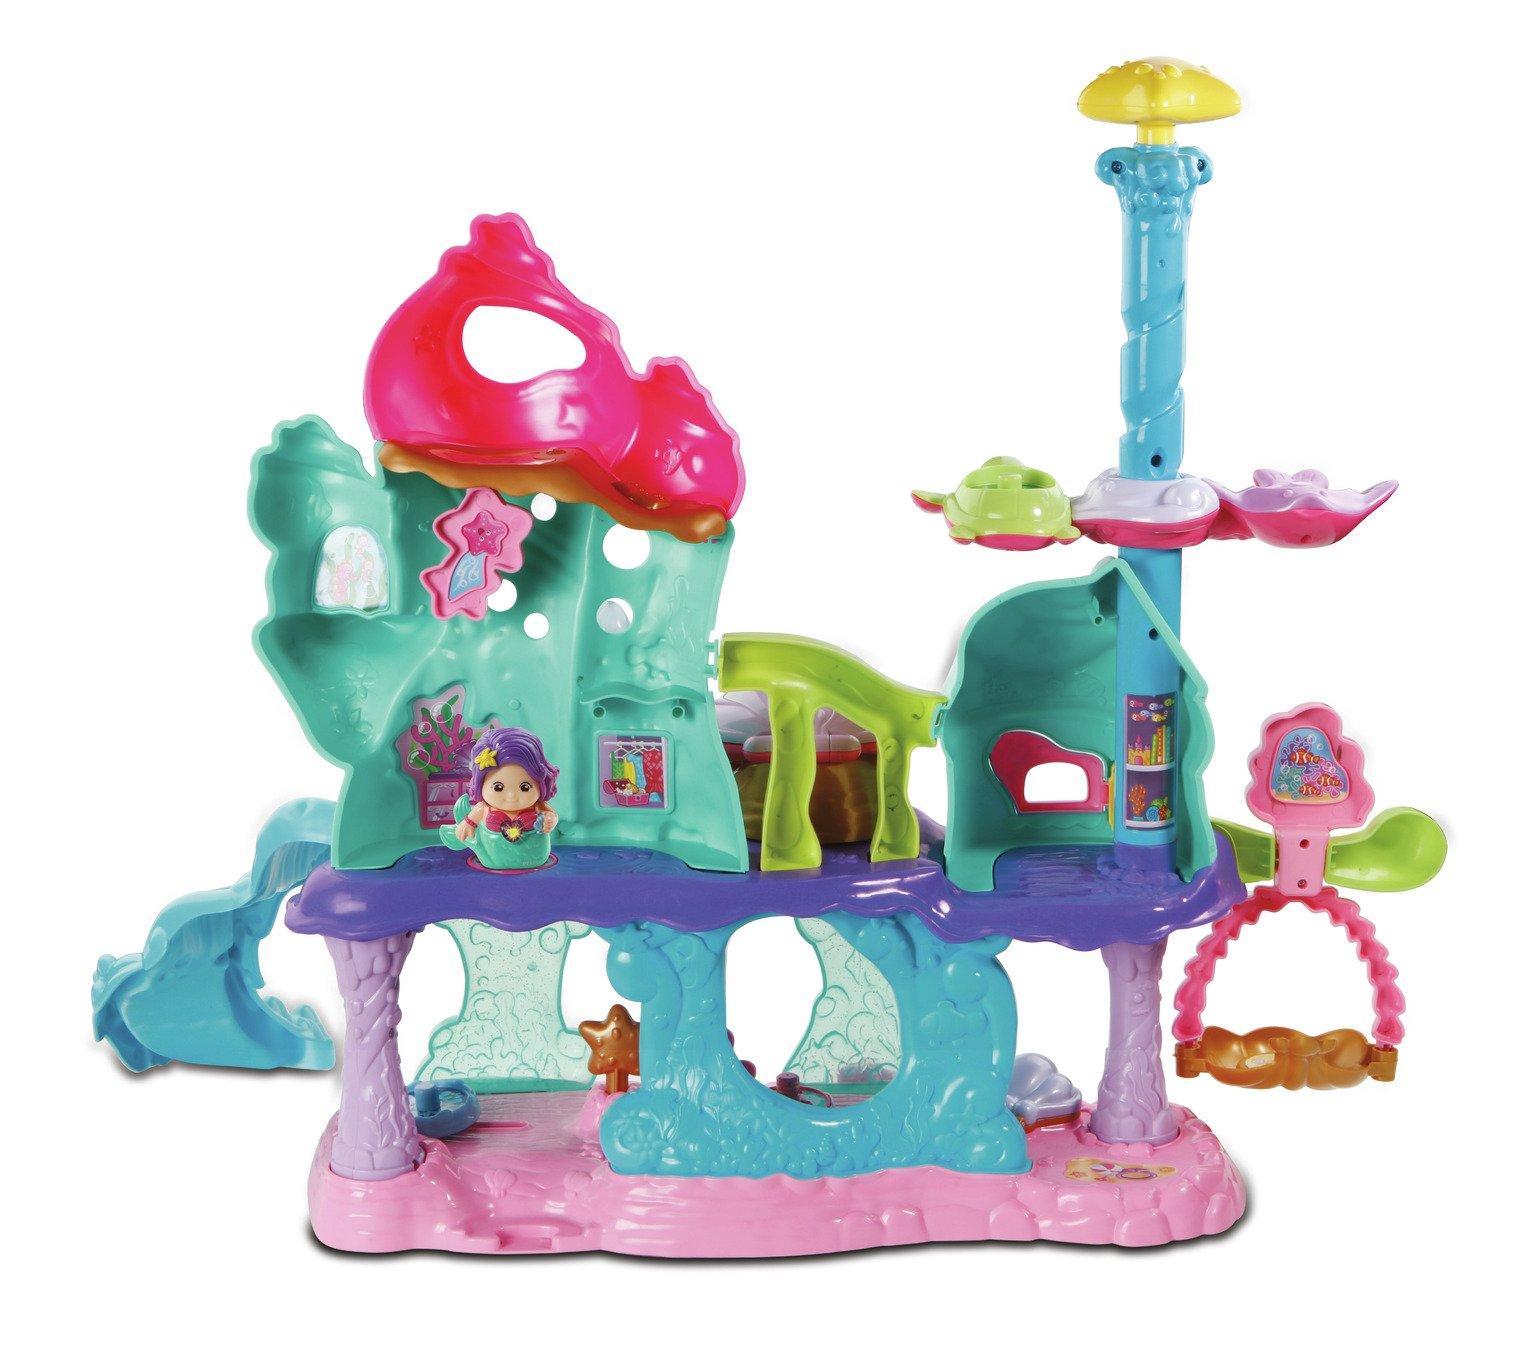 VTech Toot-Toot Friends Mermaid Land Playset